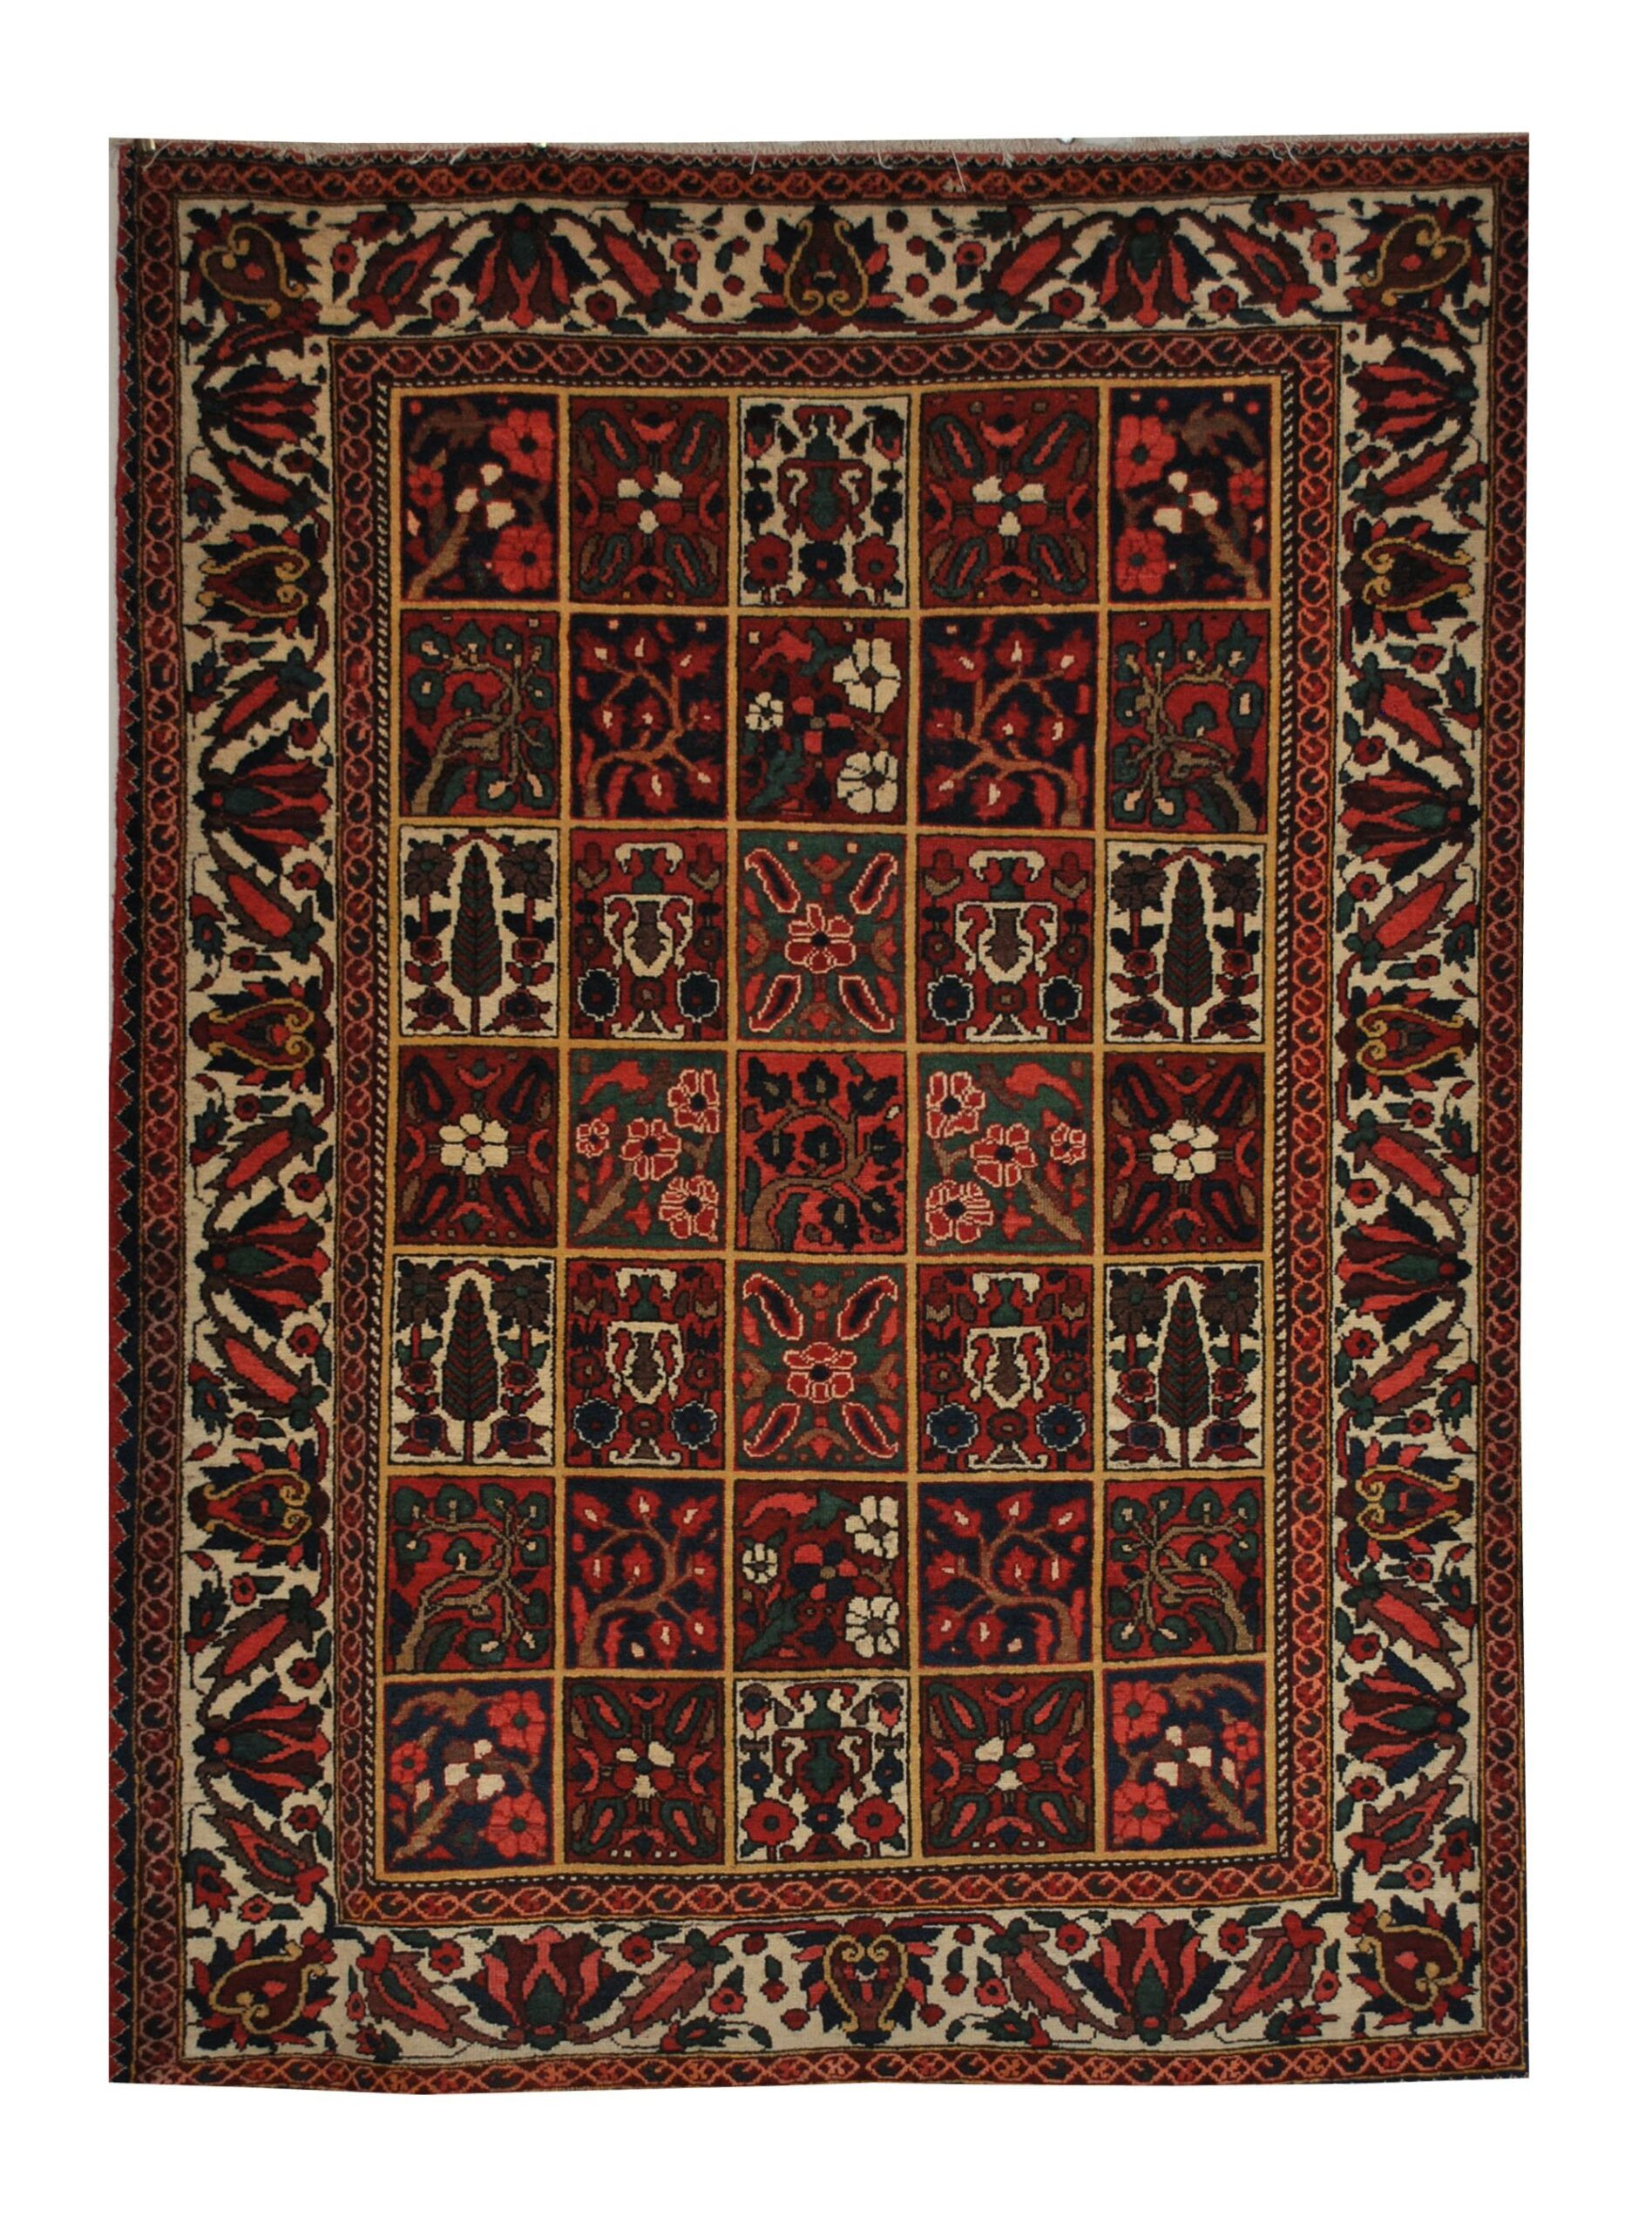 "Antique Persian Bakhtiari 5' 5"" x 7' Handmade Wool Area Rug - Shabahang Royal Carpet"